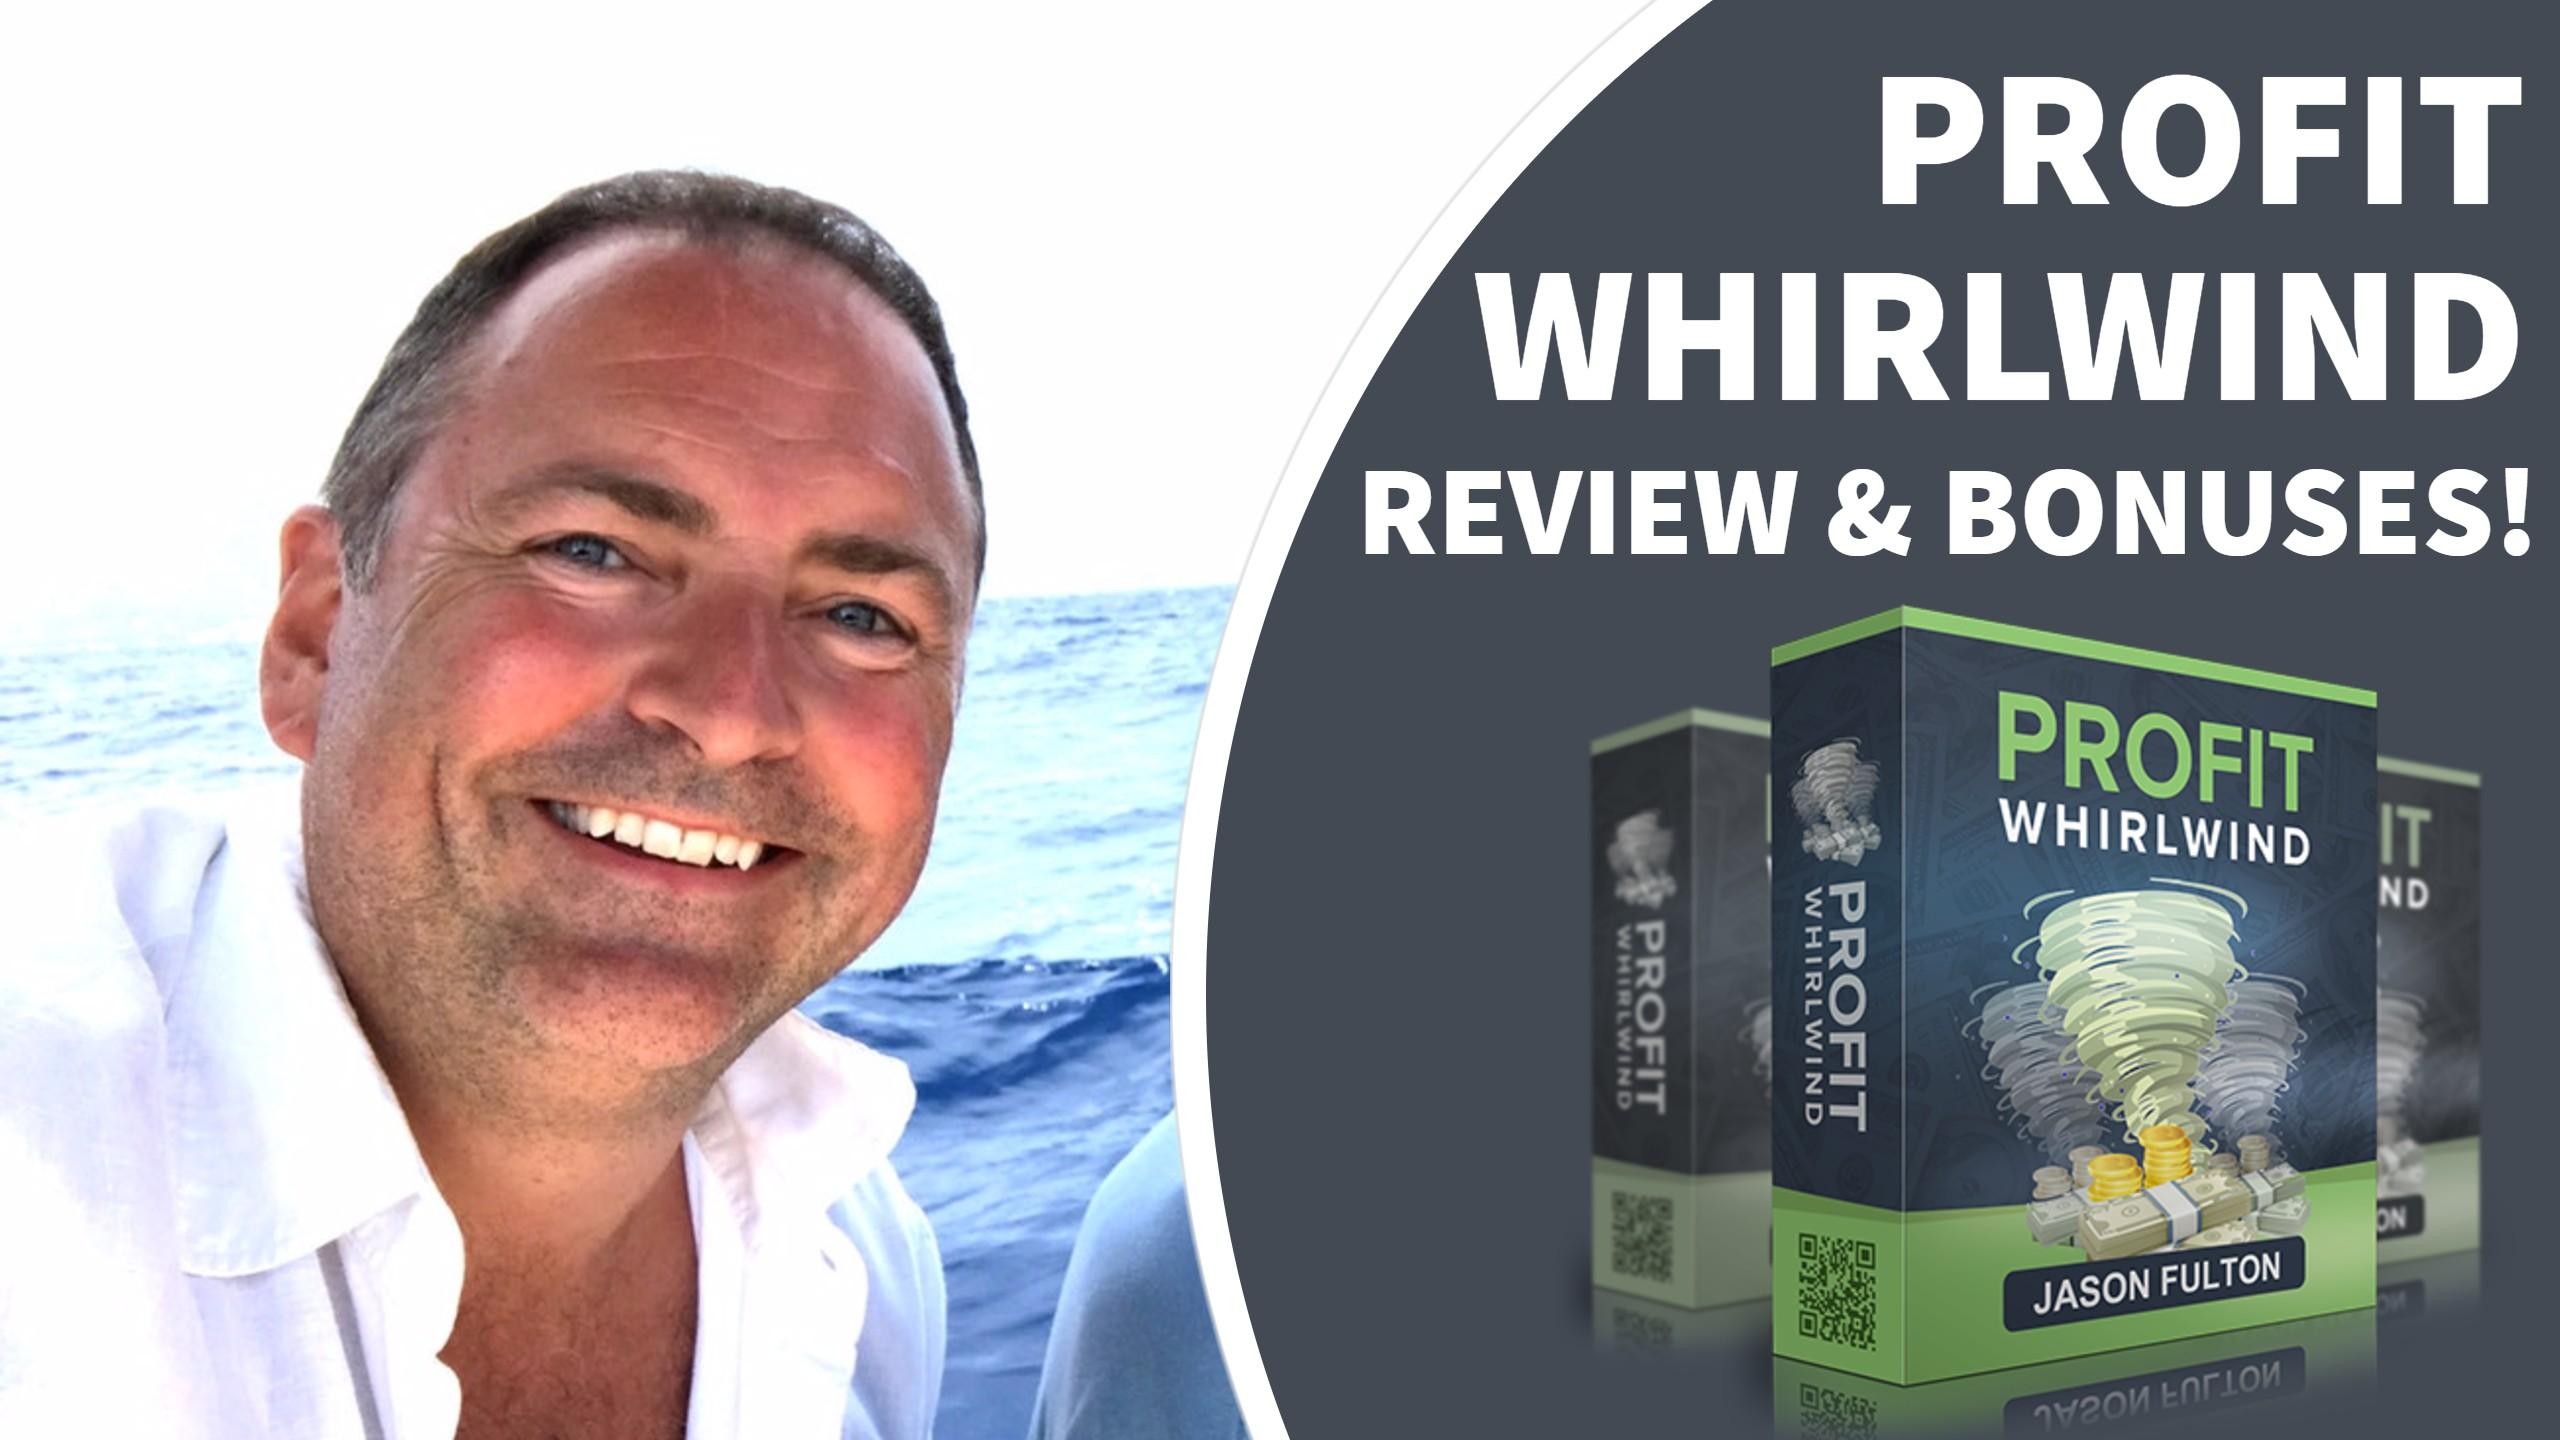 Profit Whirlwind Review & Bonuses